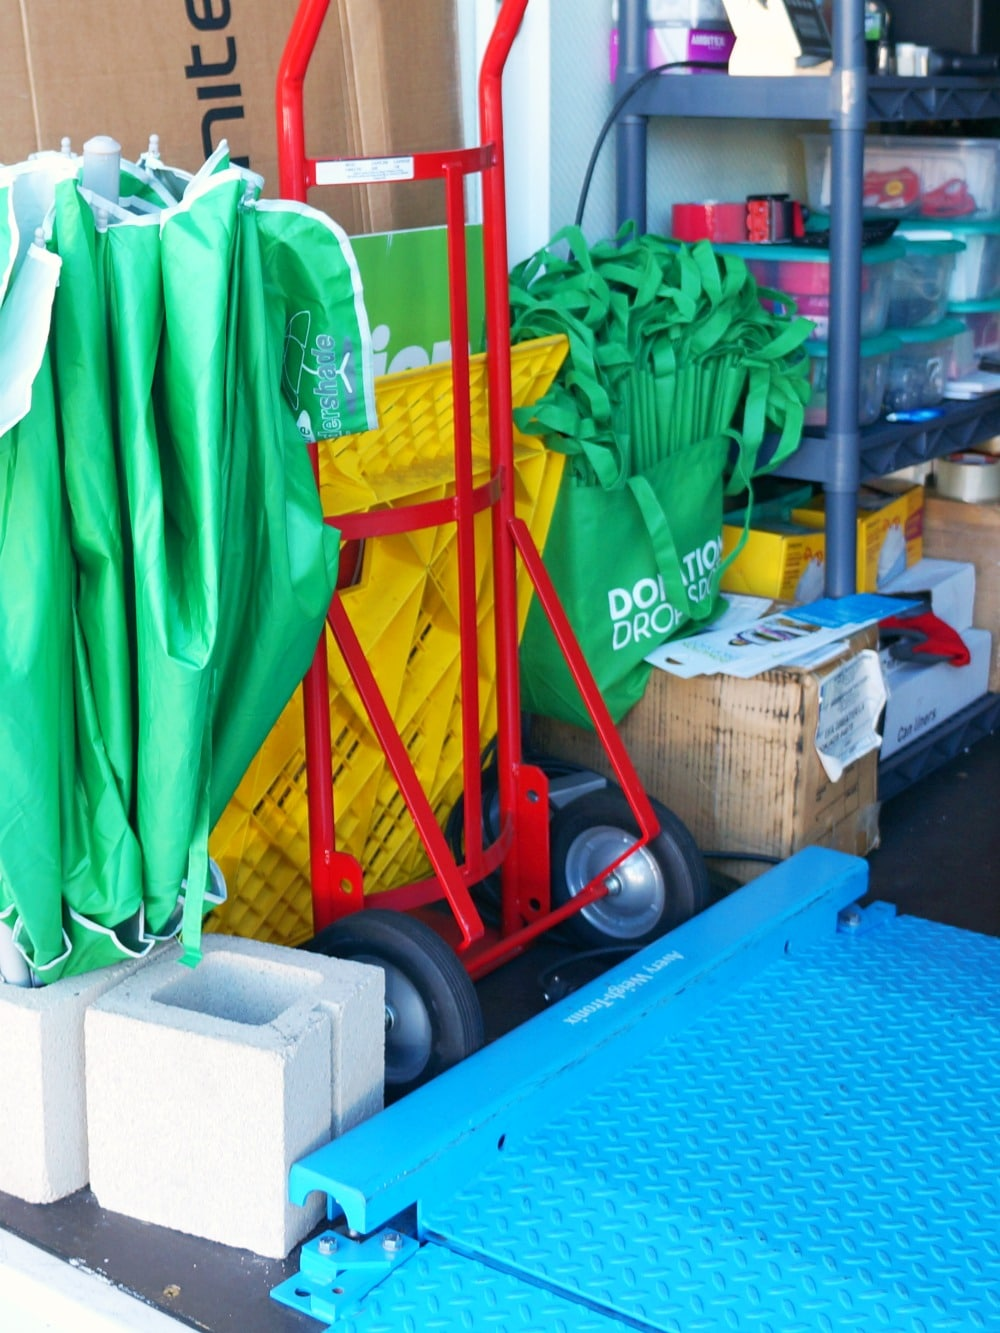 donation bags at Savers Donation Drop Spots